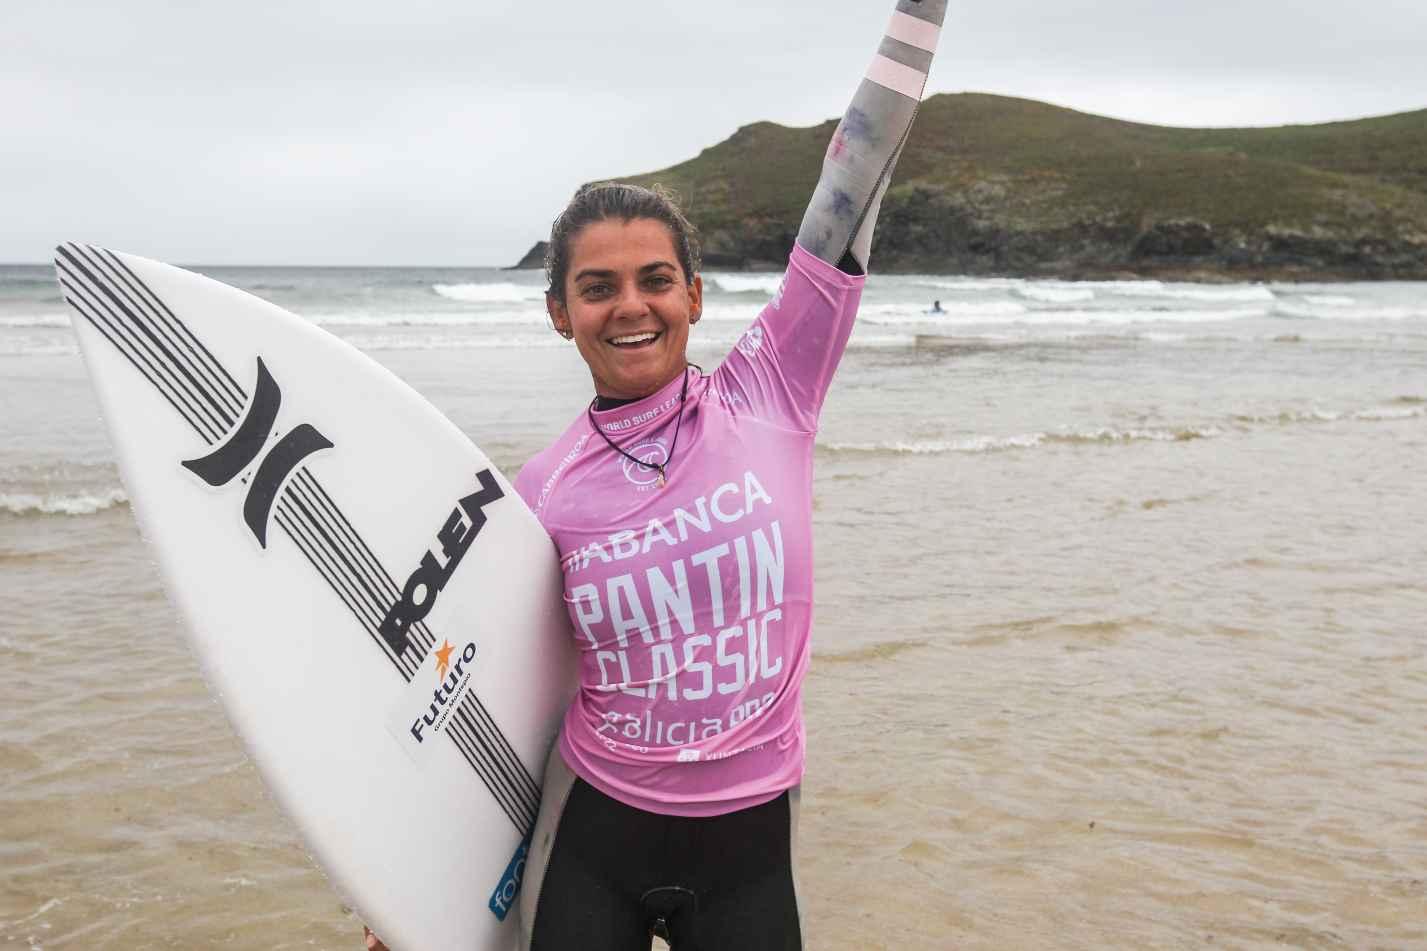 surf30 pantin classic 2021 wsl surf Carolina Mendes %2528PRT%2529 wins0480PantinClassic2021Masurel